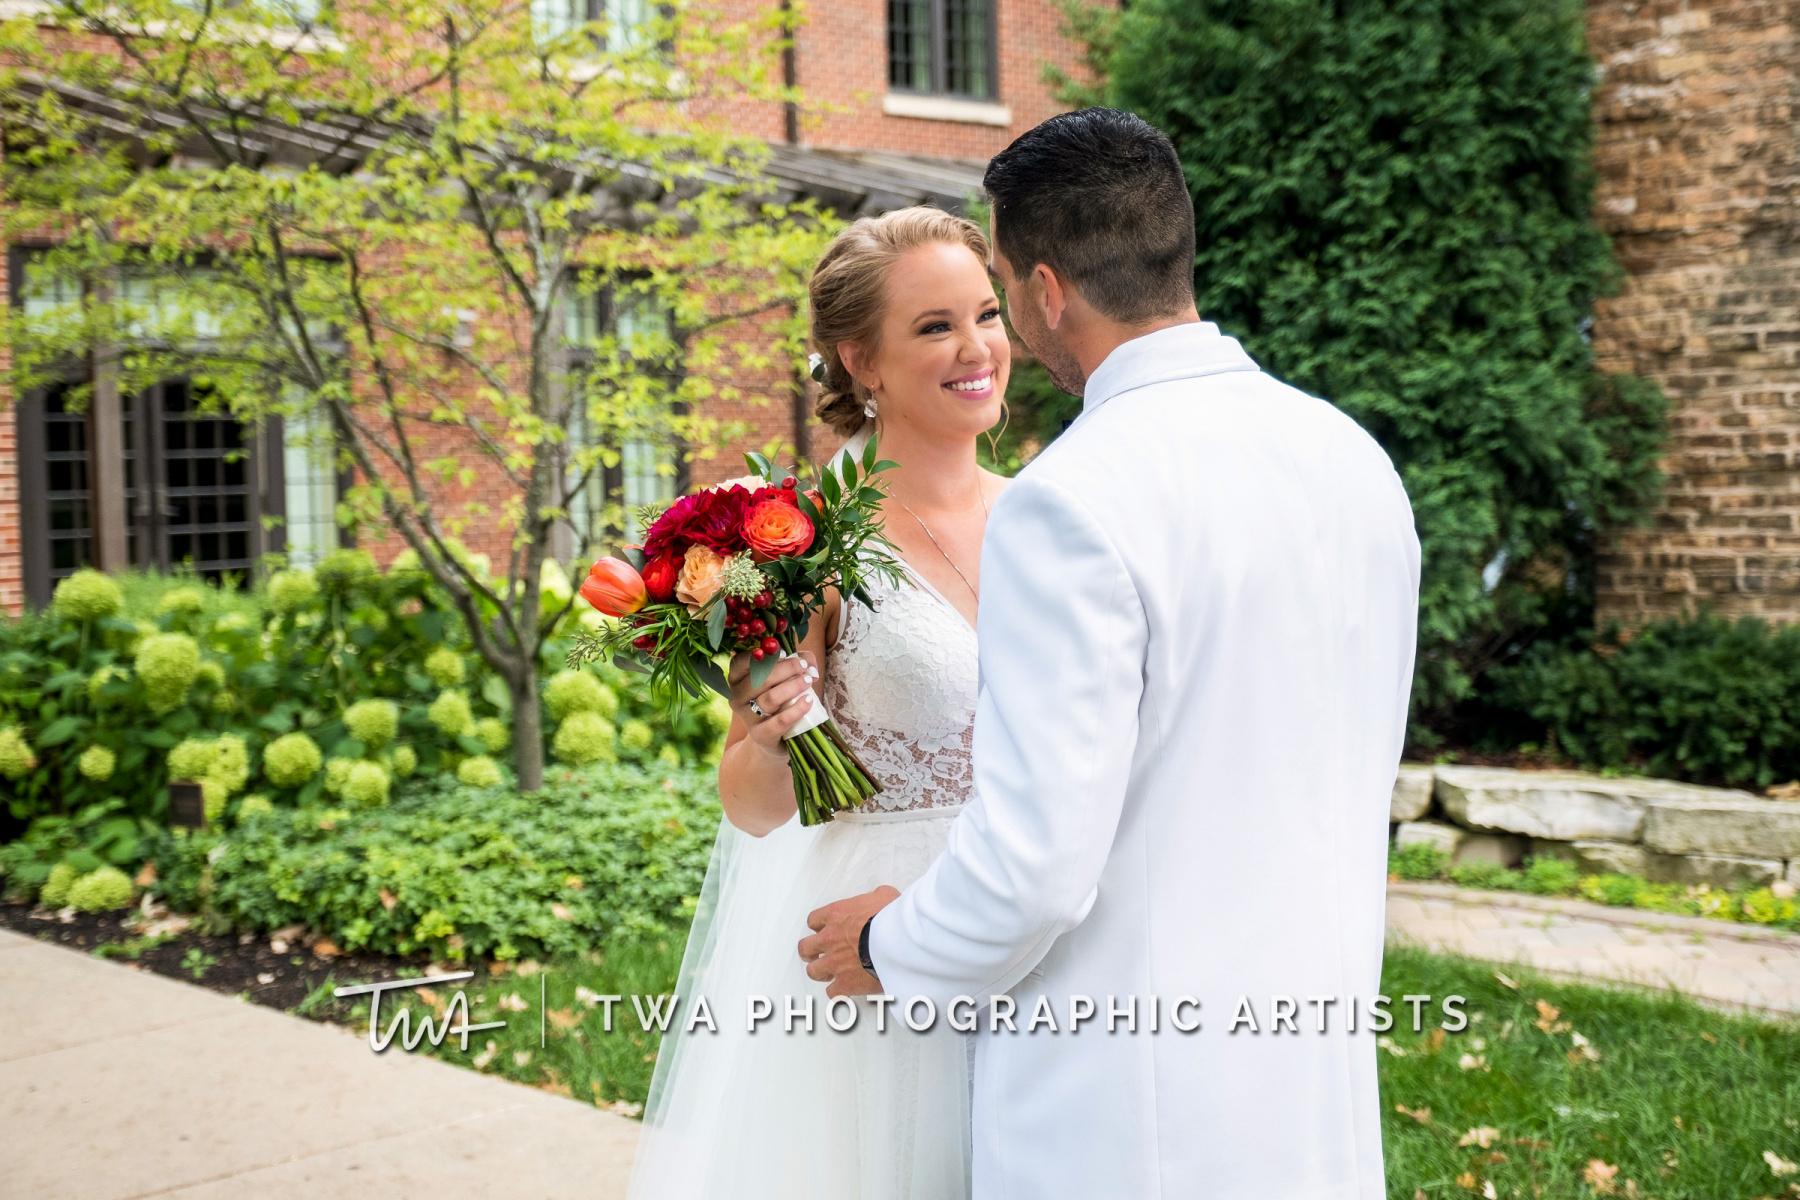 Chicago-Wedding-Photographers-Renaissance-Hotel_Hohensee_Fleishman_JG_DK-014-0135